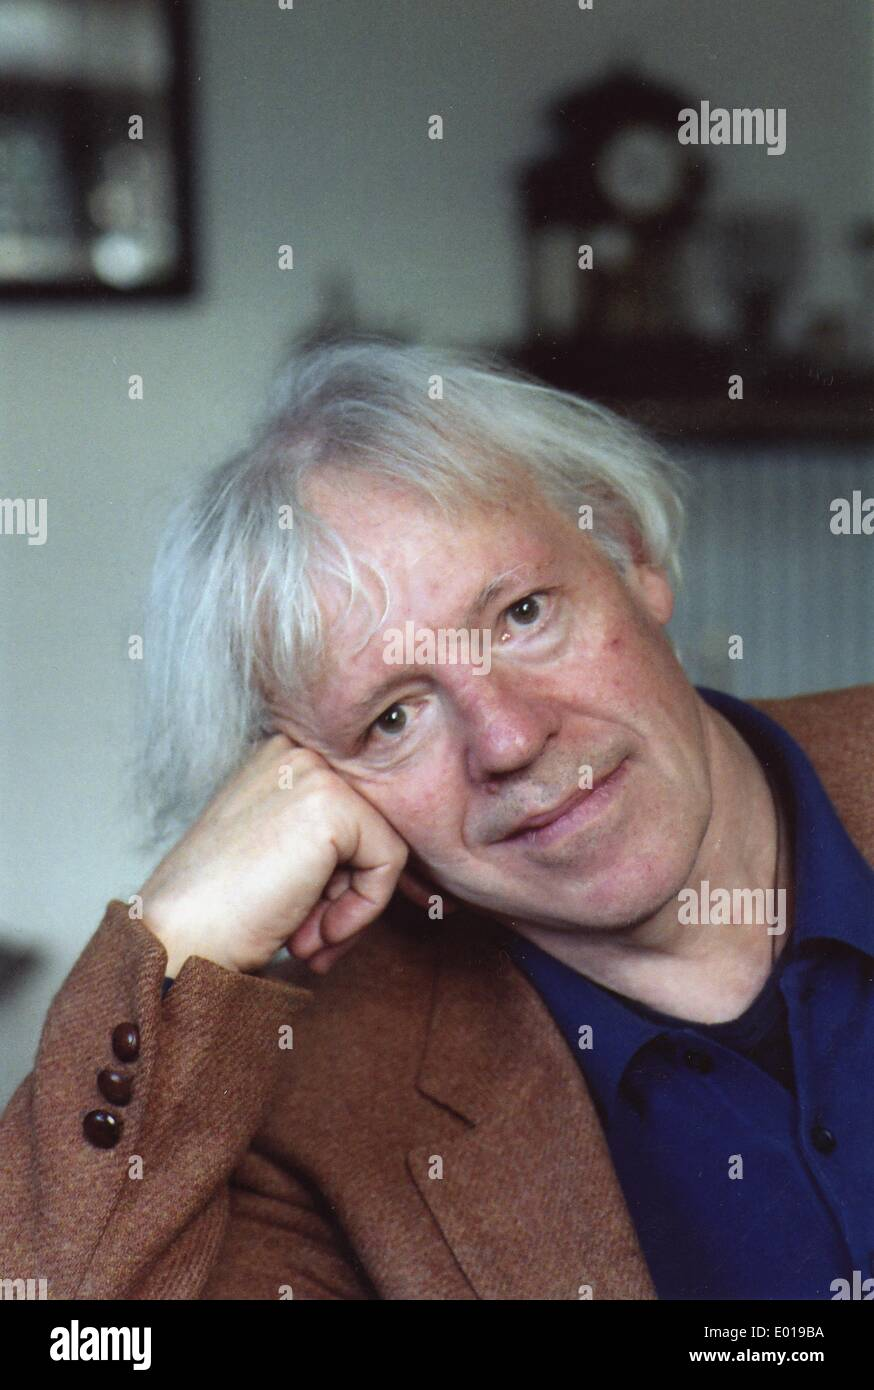 Wolfgang Schmidbauer, 2006 - Stock Image